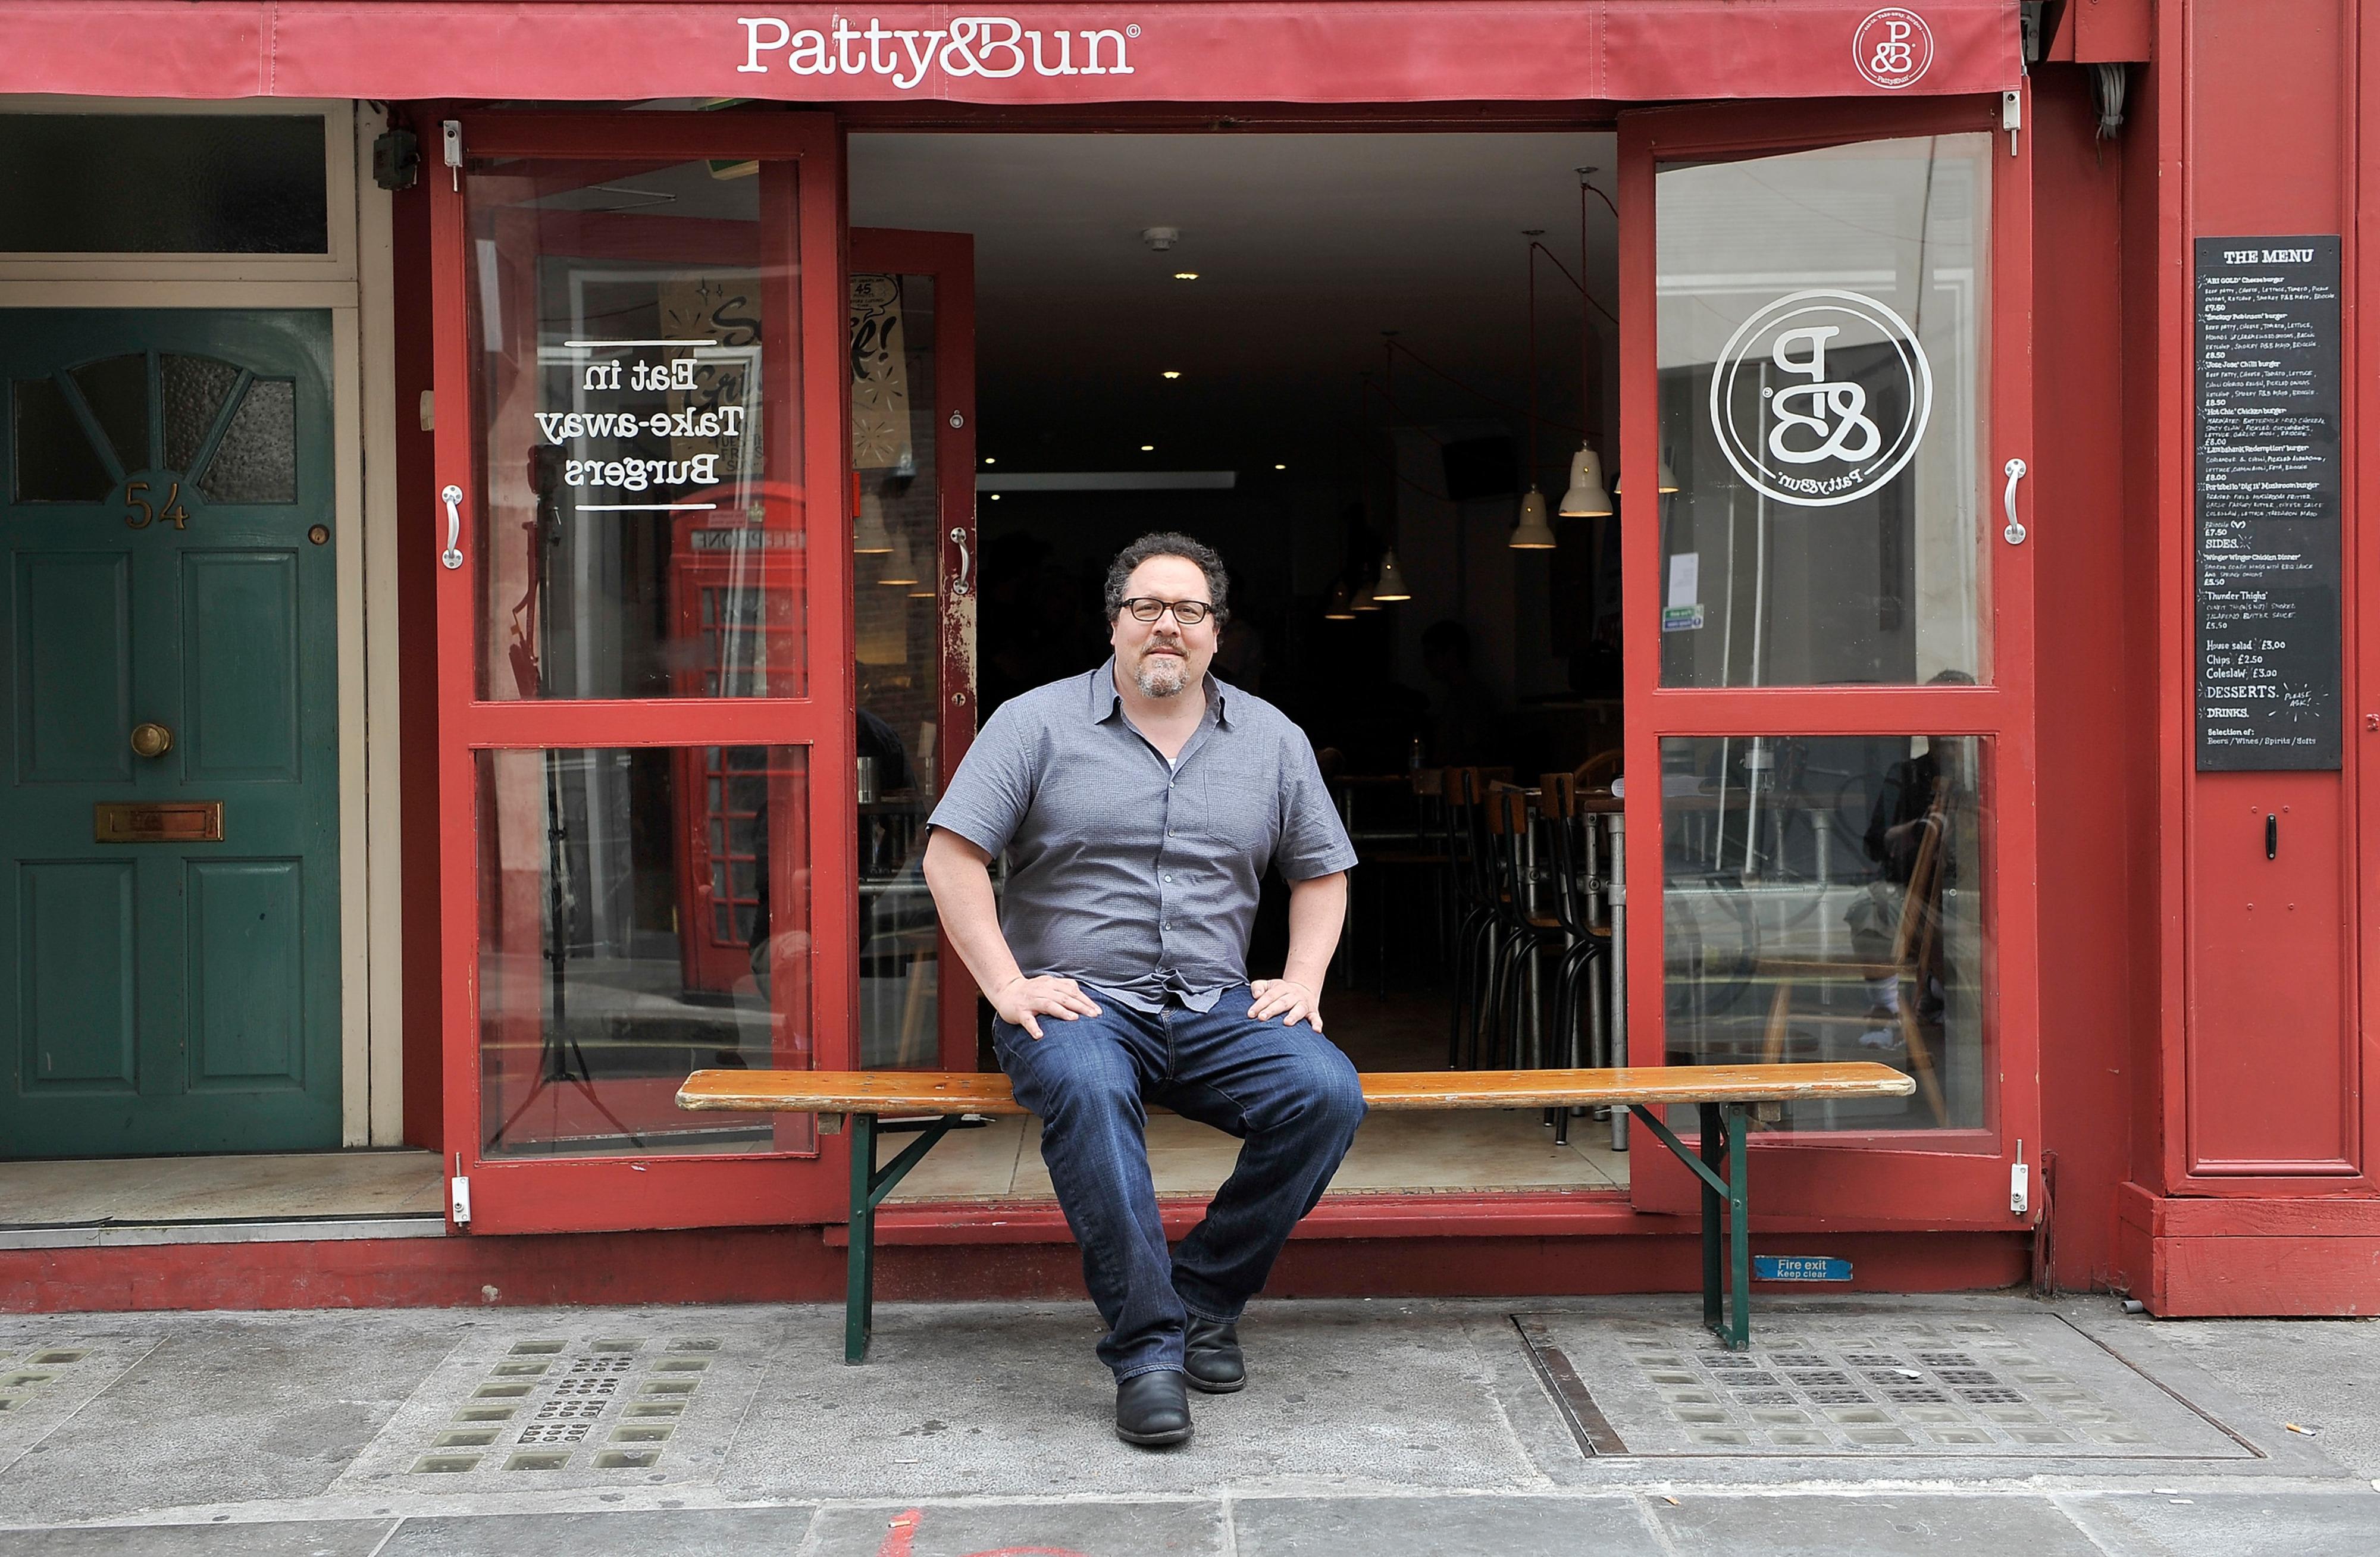 Jon Favreau Movie Spawning Actual Restaurant With Roy Choi